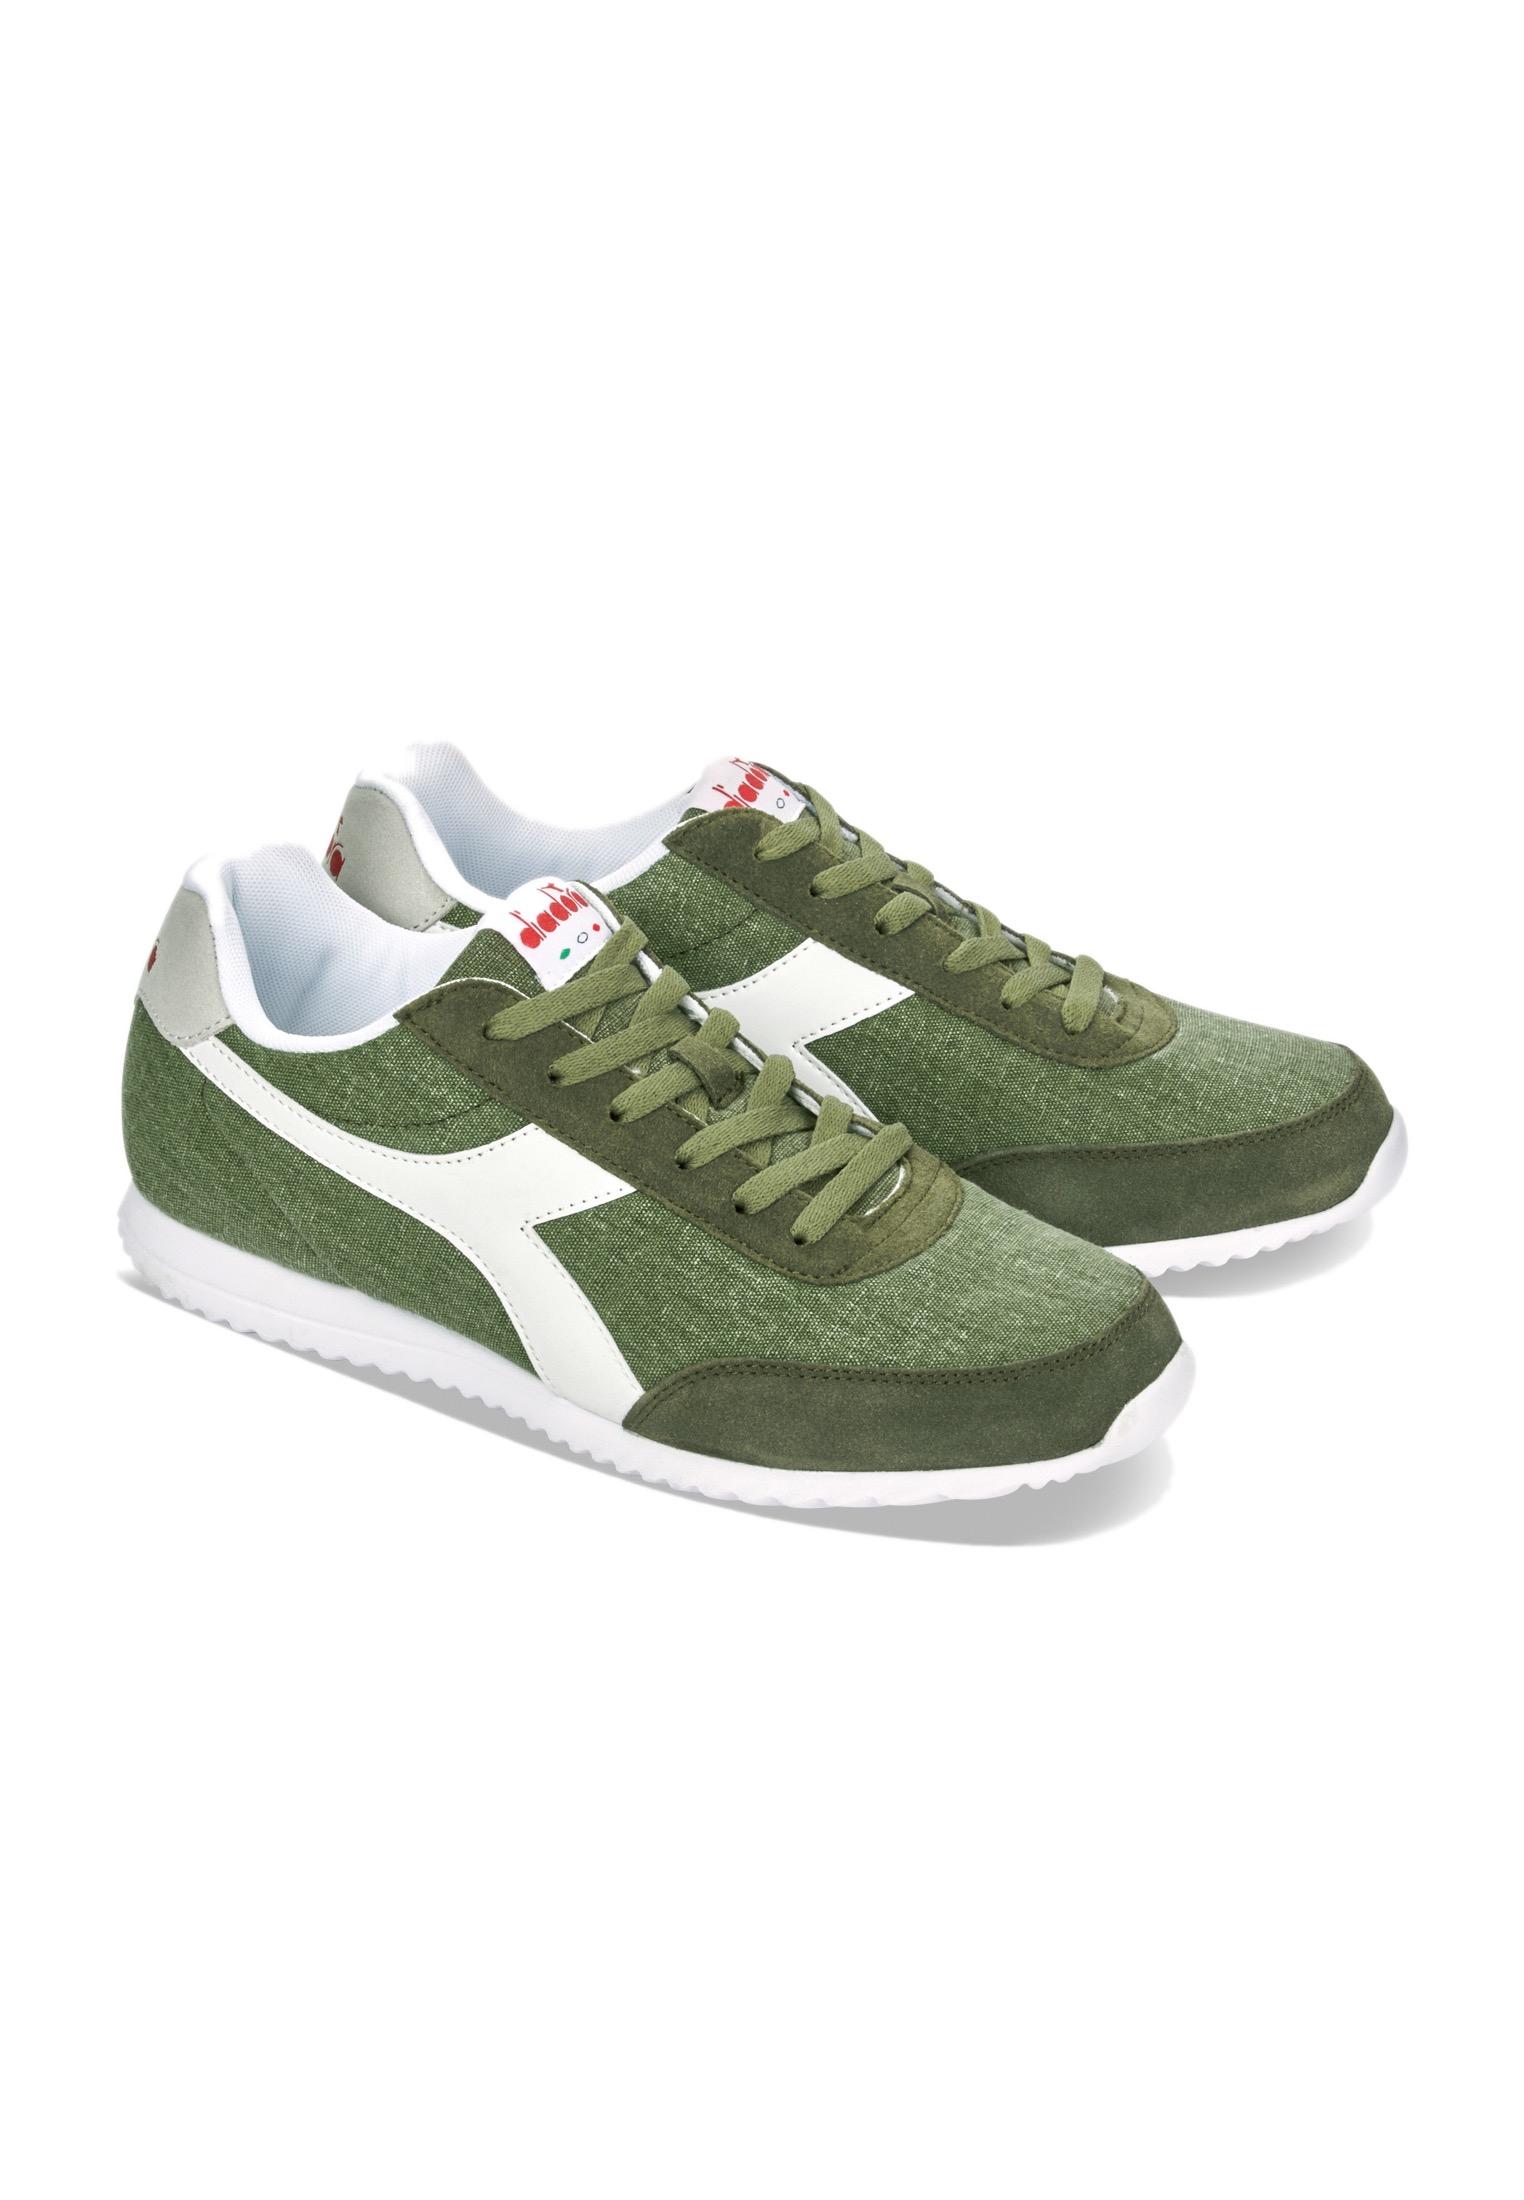 Scarpe-Diadora-Jog-Light-C-Sneakers-sportive-uomo-donna-vari-colori-e-taglie miniatura 47